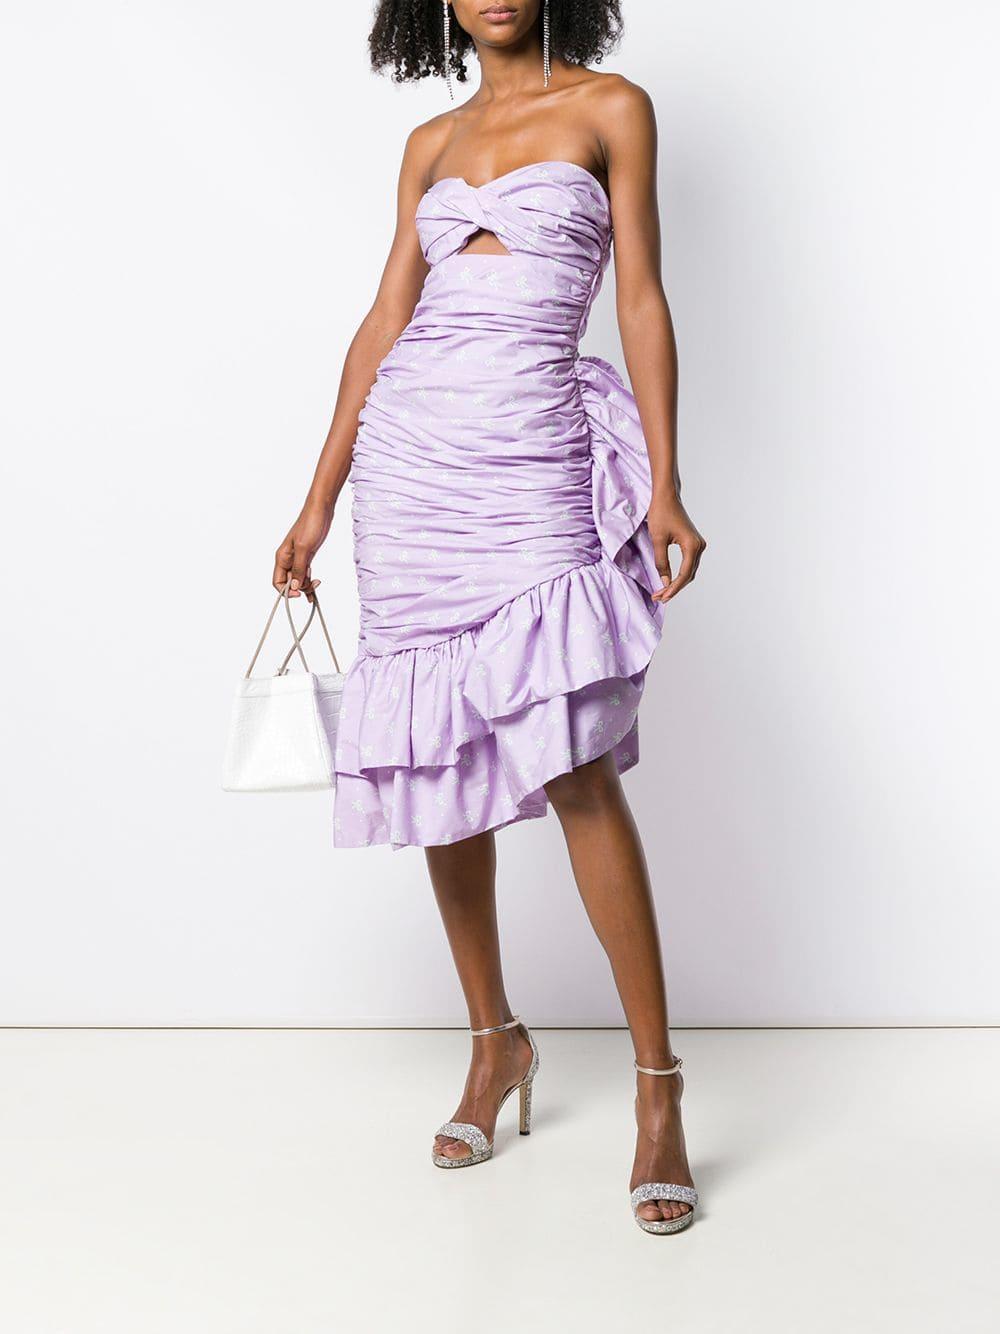 529f242e168 Vivetta Strapless Ruffle Dress in Purple - Lyst